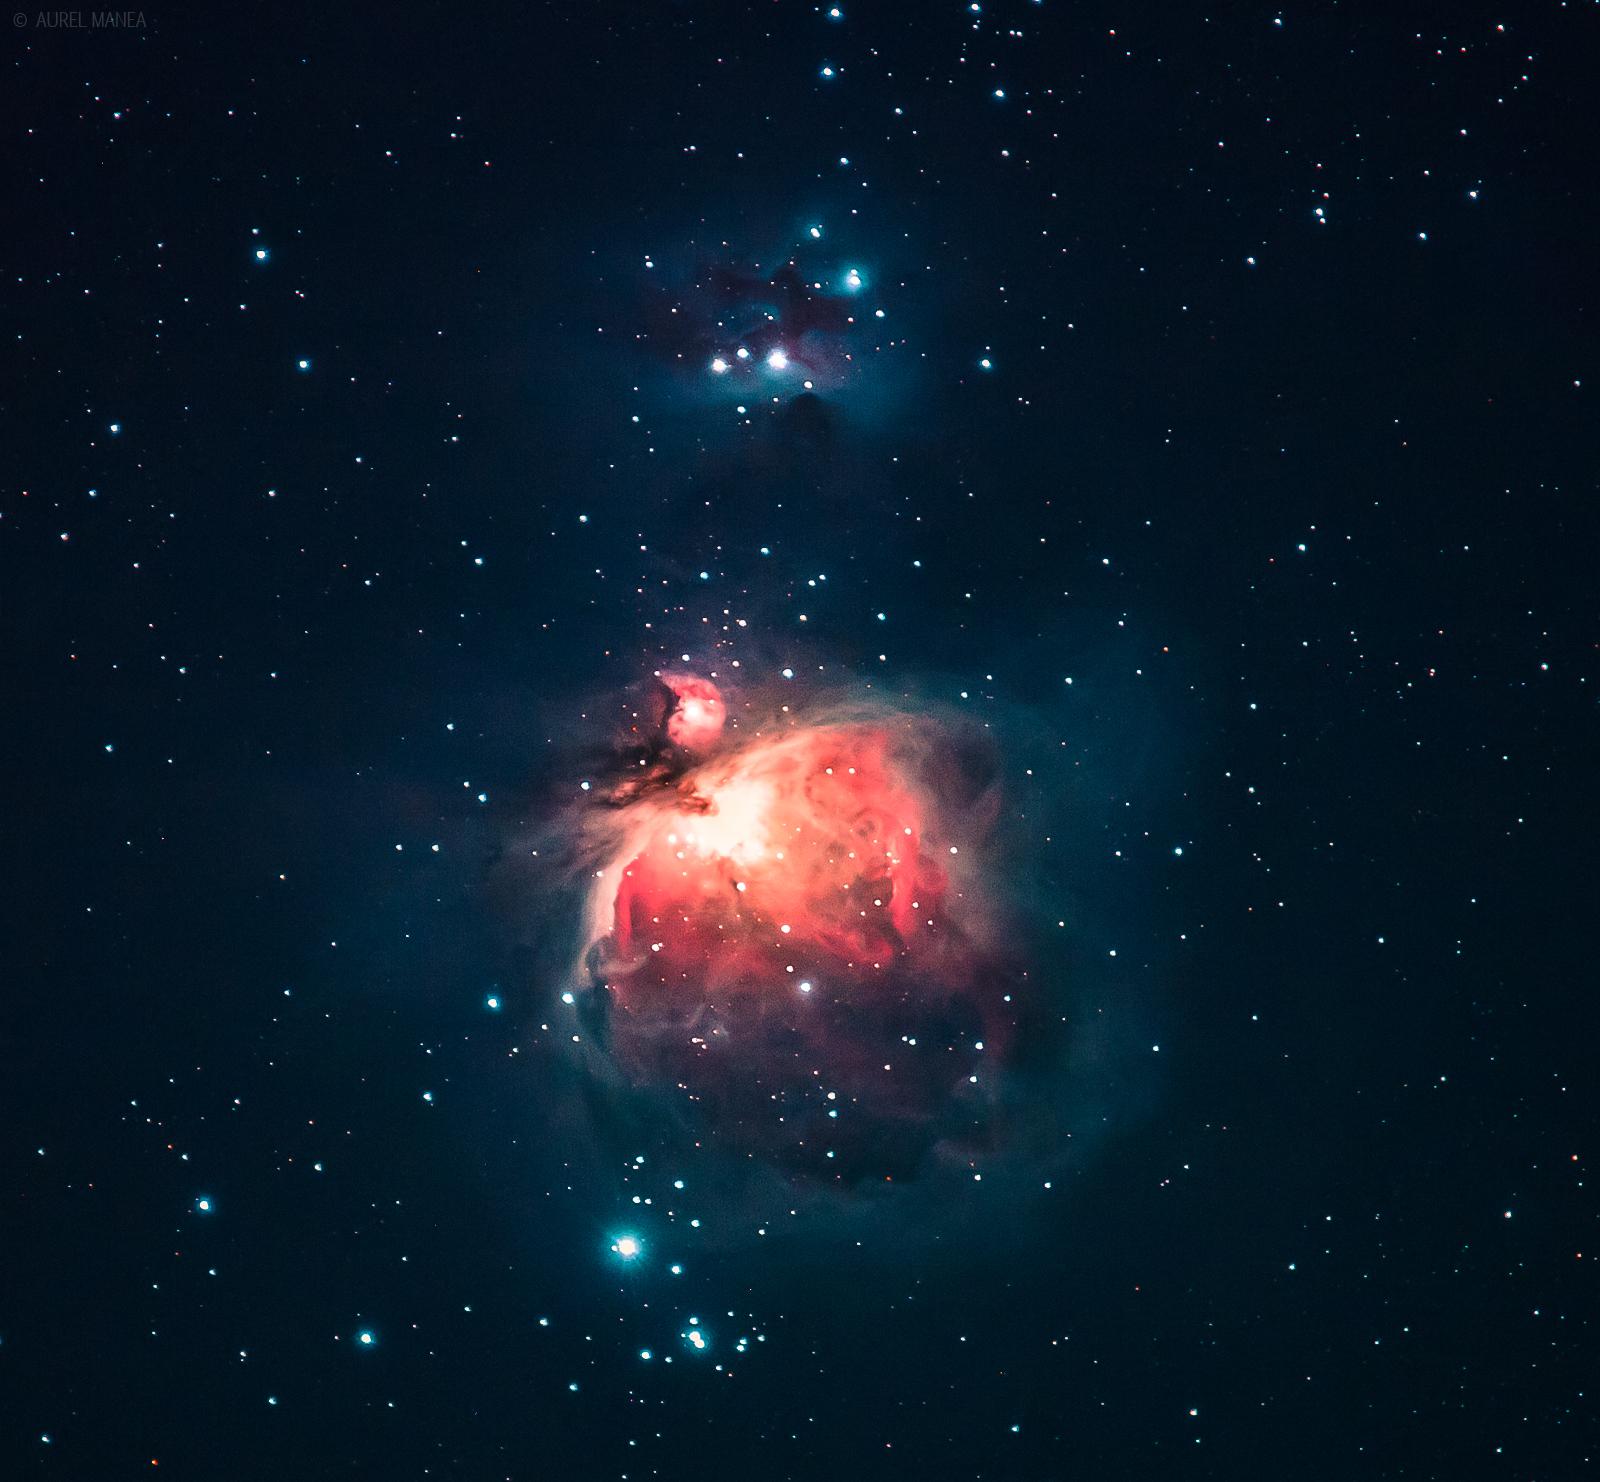 IMAGE: http://www.aurelm.com/wp-content/uploads/M42-Orion-Tamron-150-600-VC-04.jpg